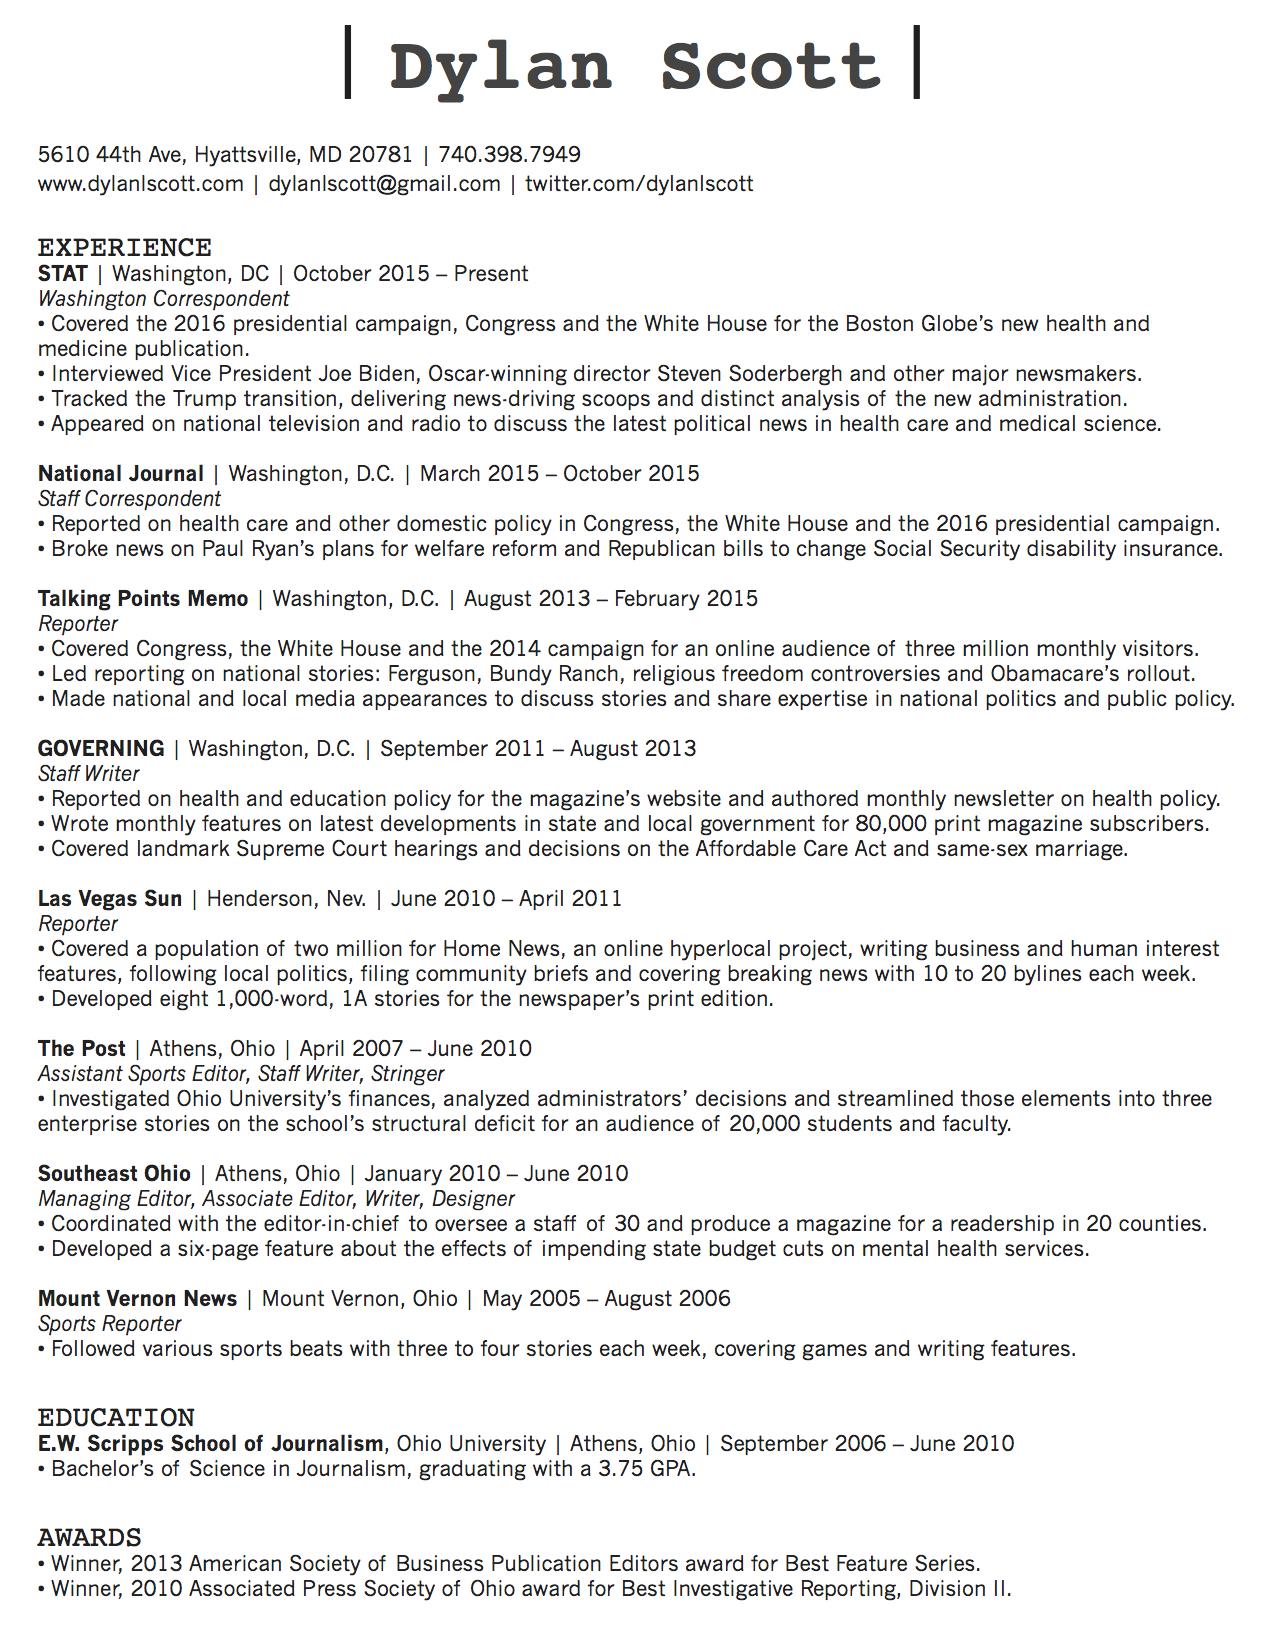 sample resume for writer resume template generator online cv maker in word making 85 enchanting build